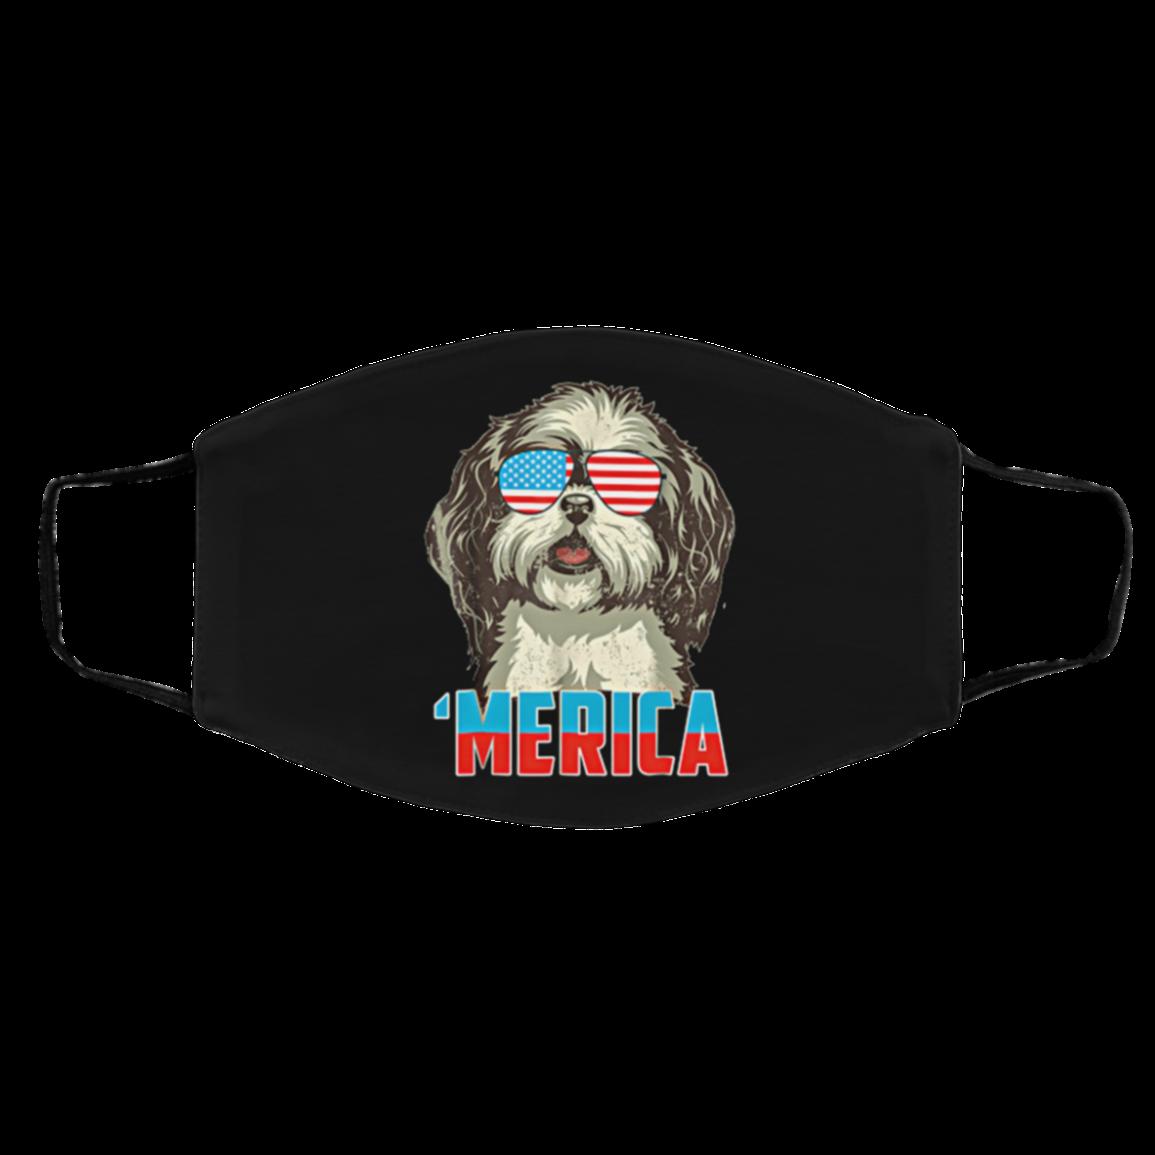 4th Of July Pa-trio-t Sh-ih Tz-u Merica Cloth Face Mask